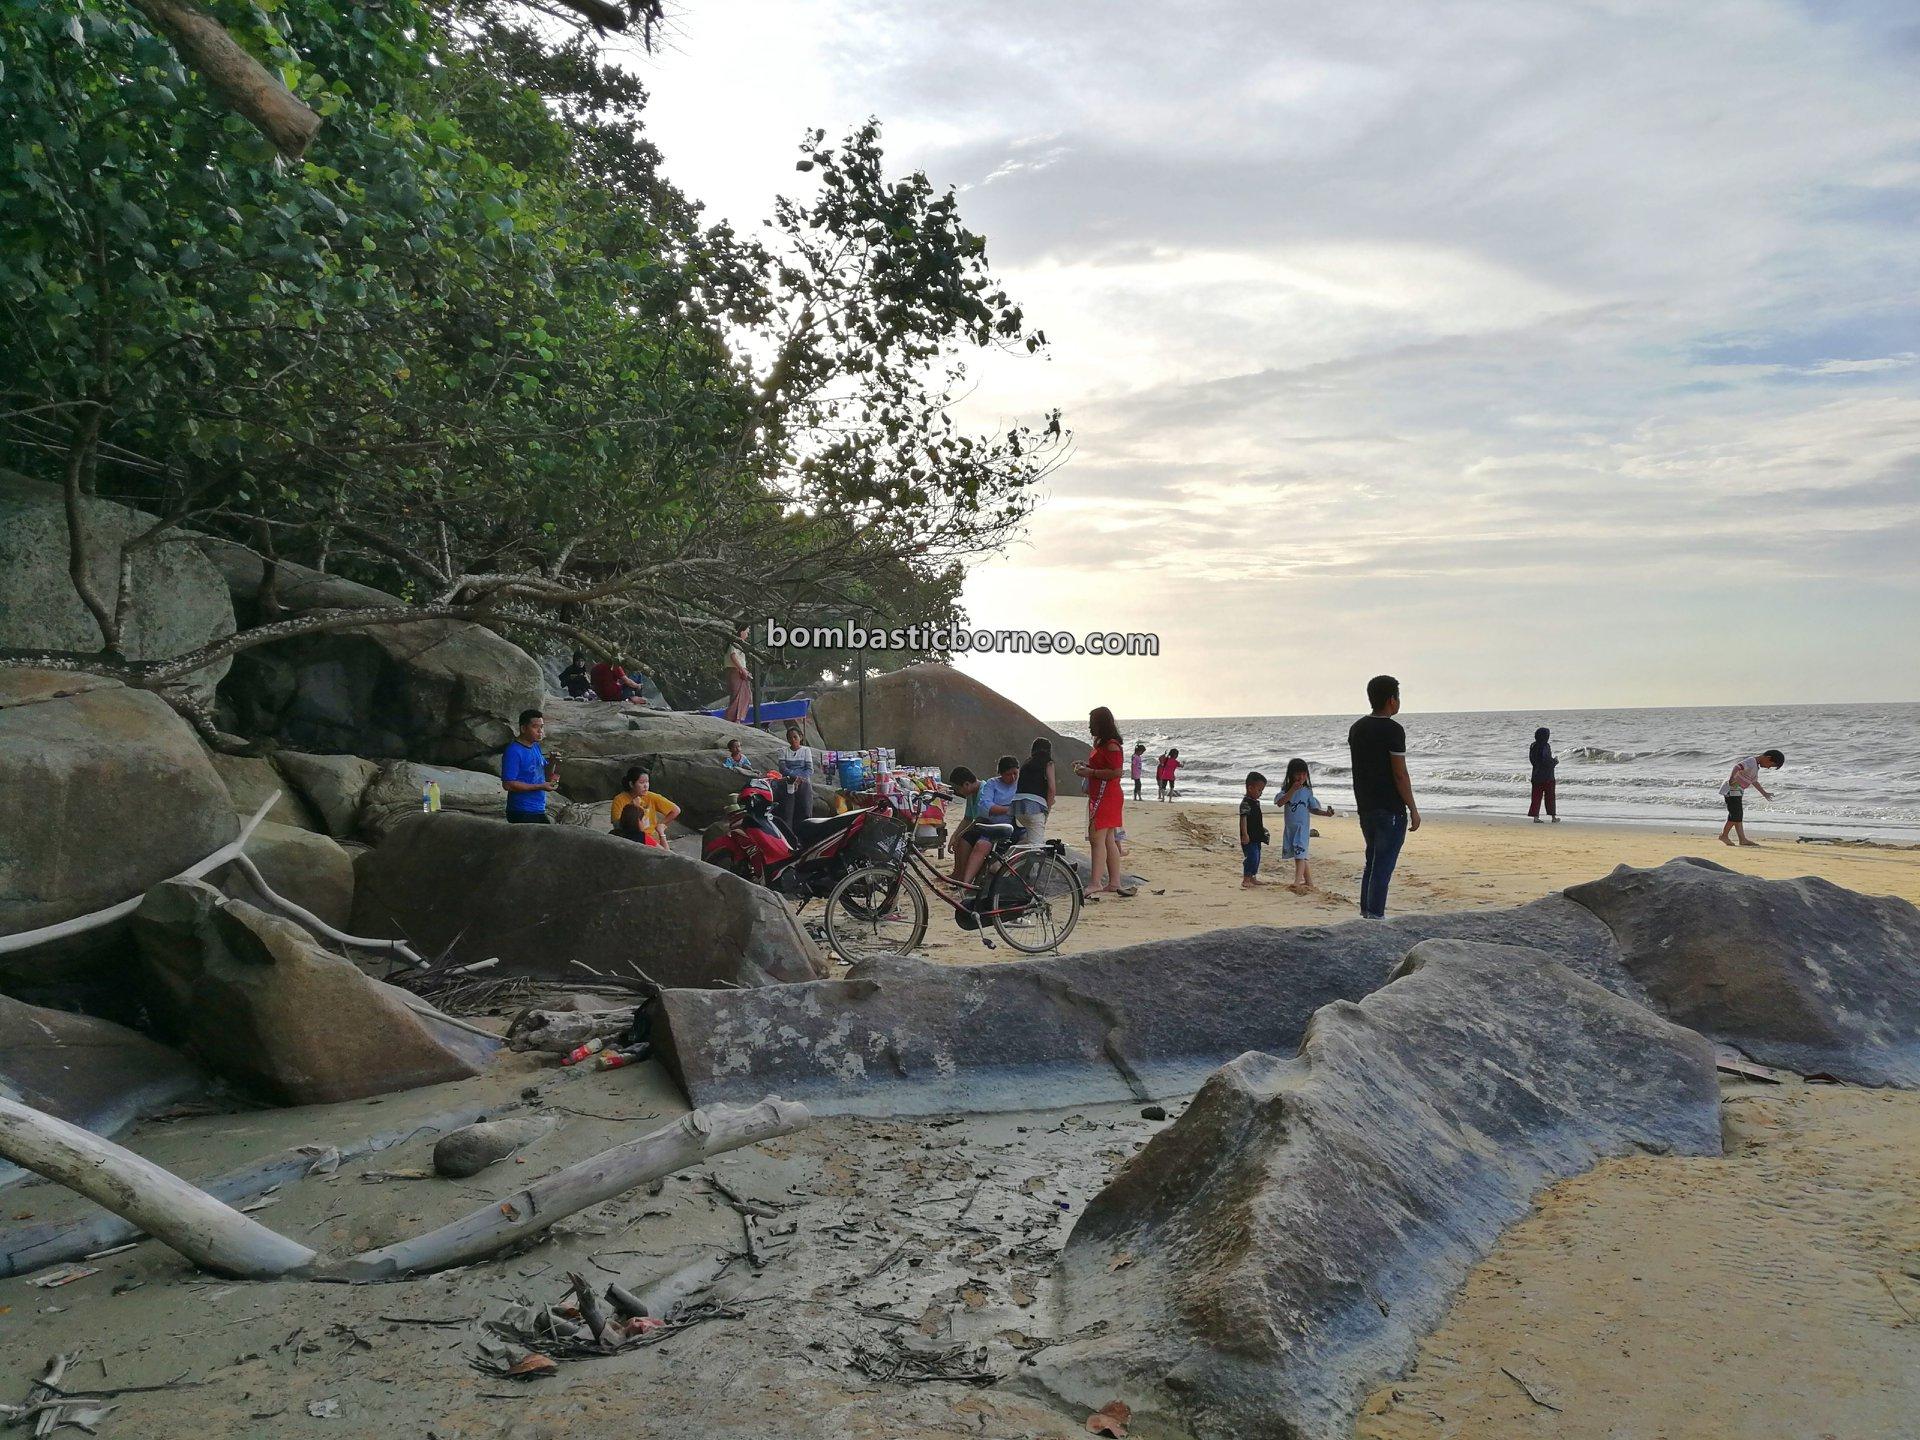 beach, adventure, nature, Malay fishing village, Kampung Melayu, Indonesia,, Tourism, tourist attraction, travel guide, backpackers, destination, Borneo, 跨境婆罗洲游踪, 印尼西加里曼丹, 三发马来渔村